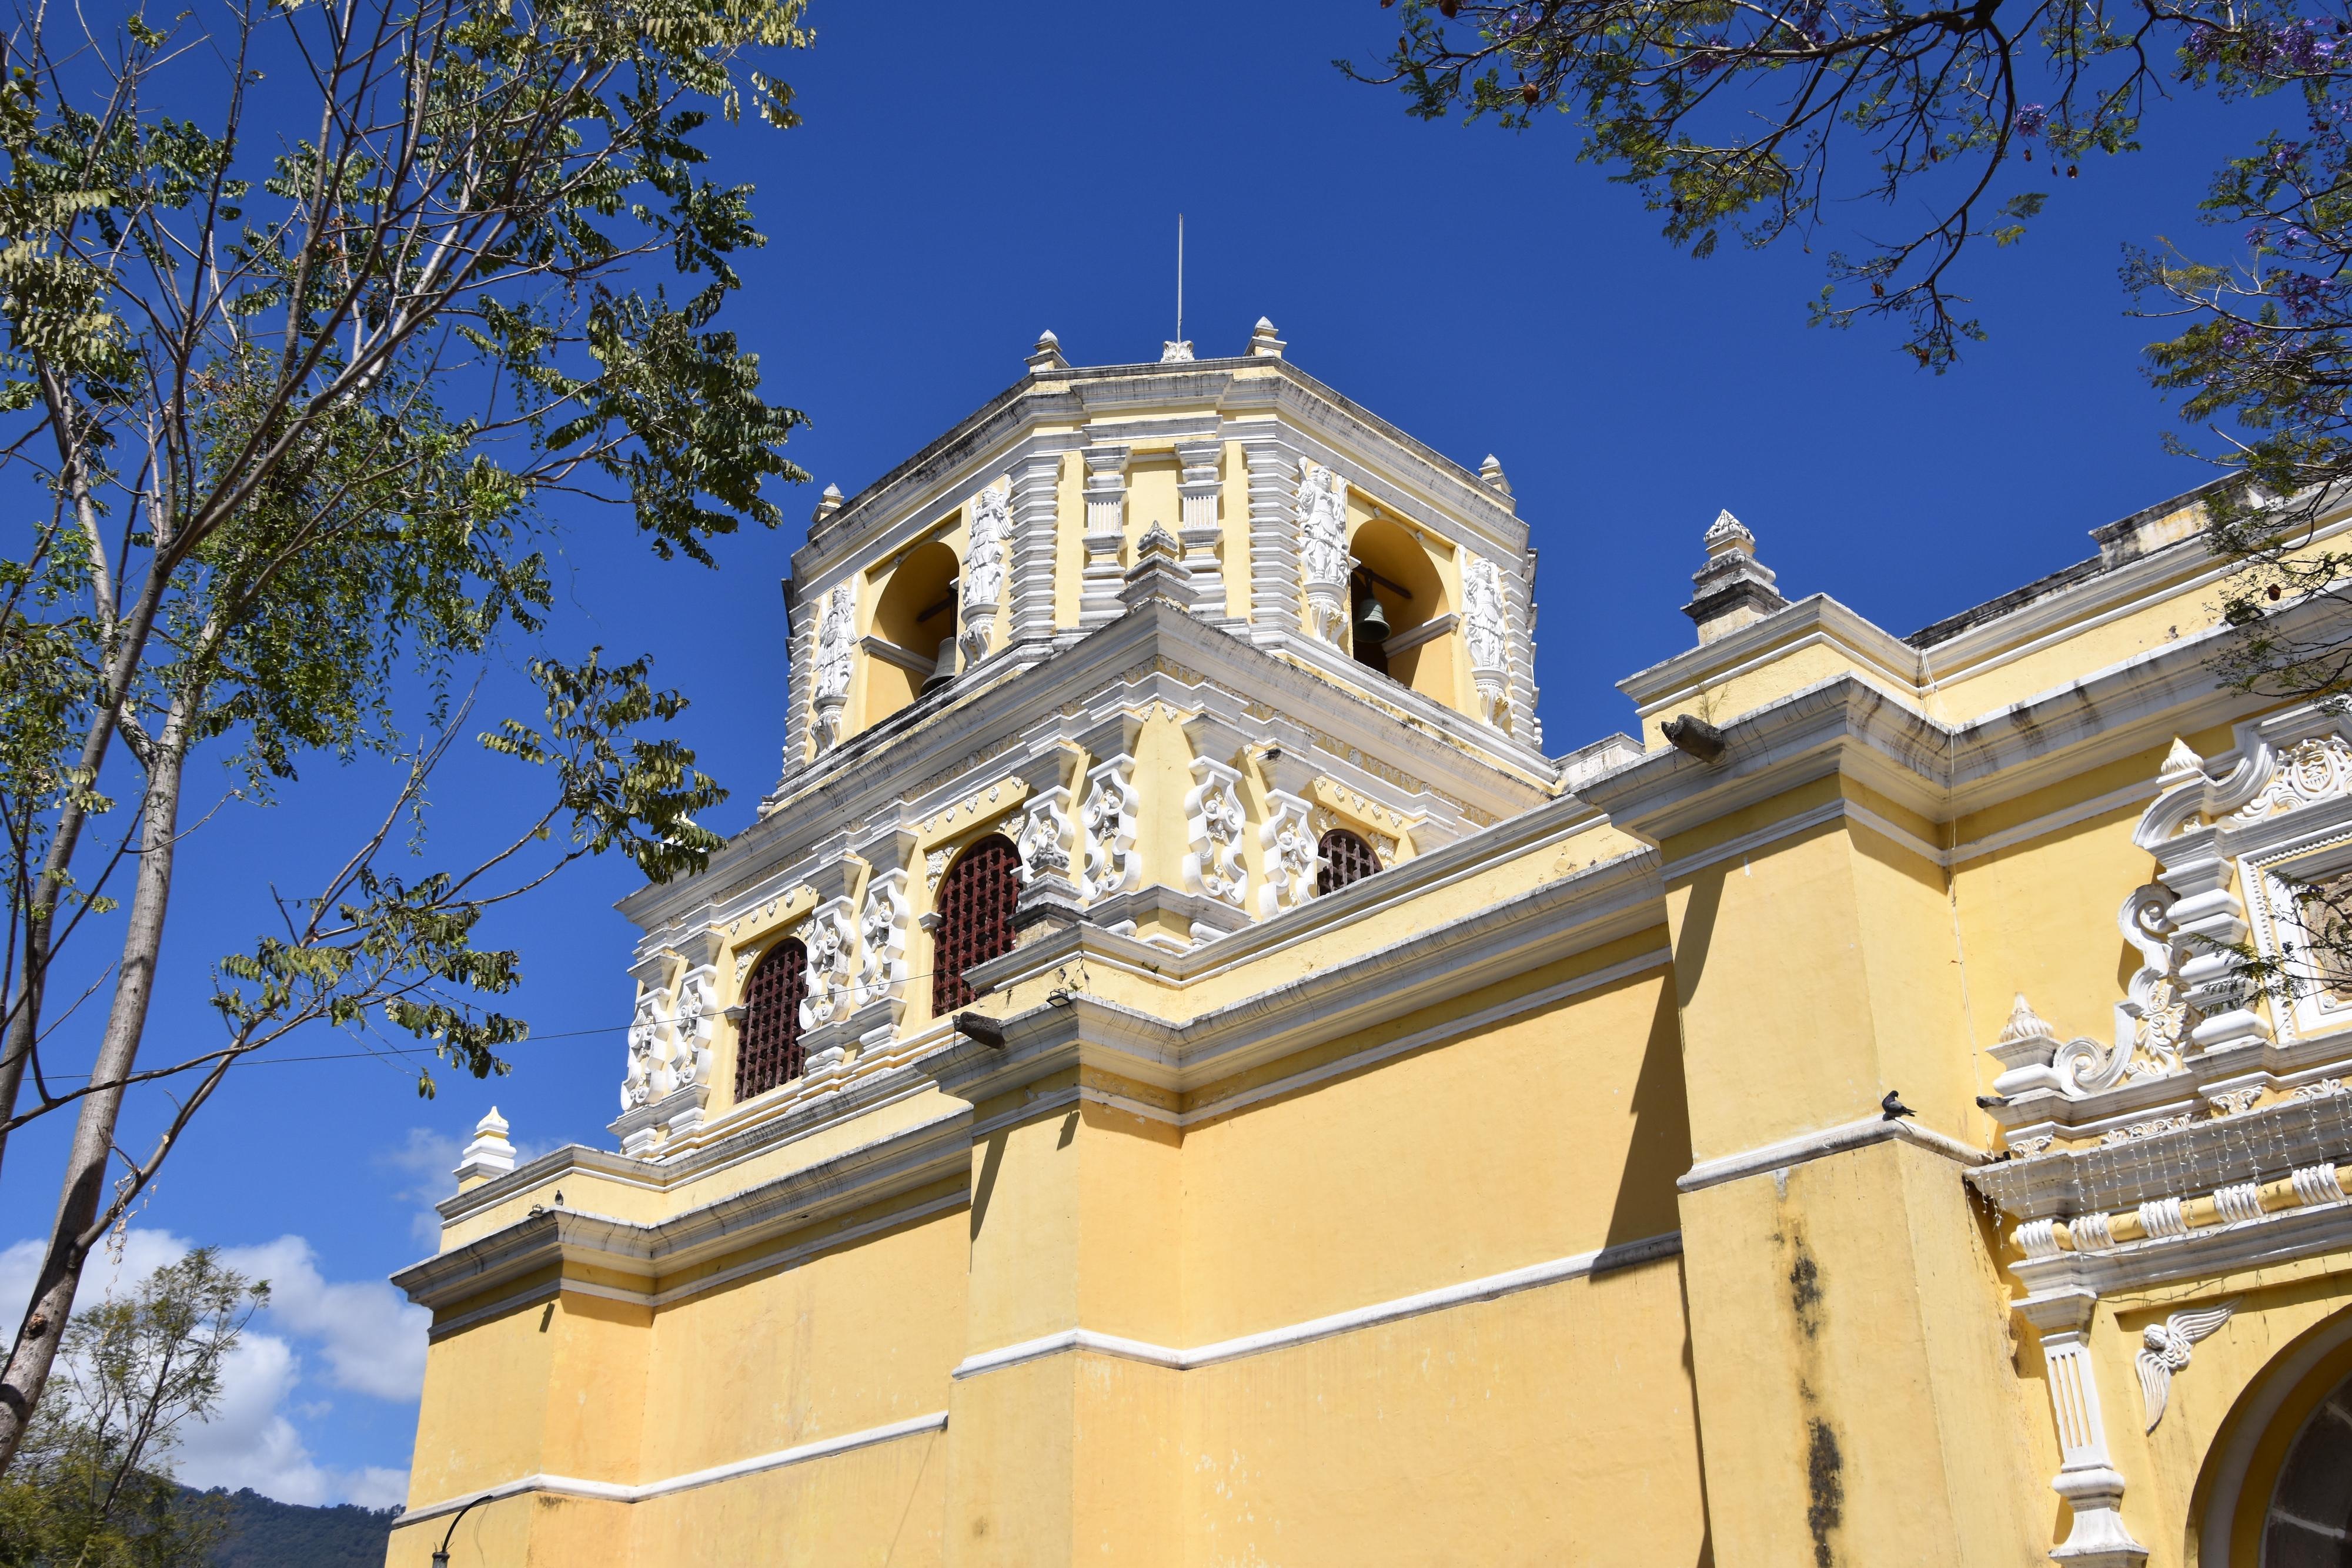 La Merced, Antigua, Guatemala